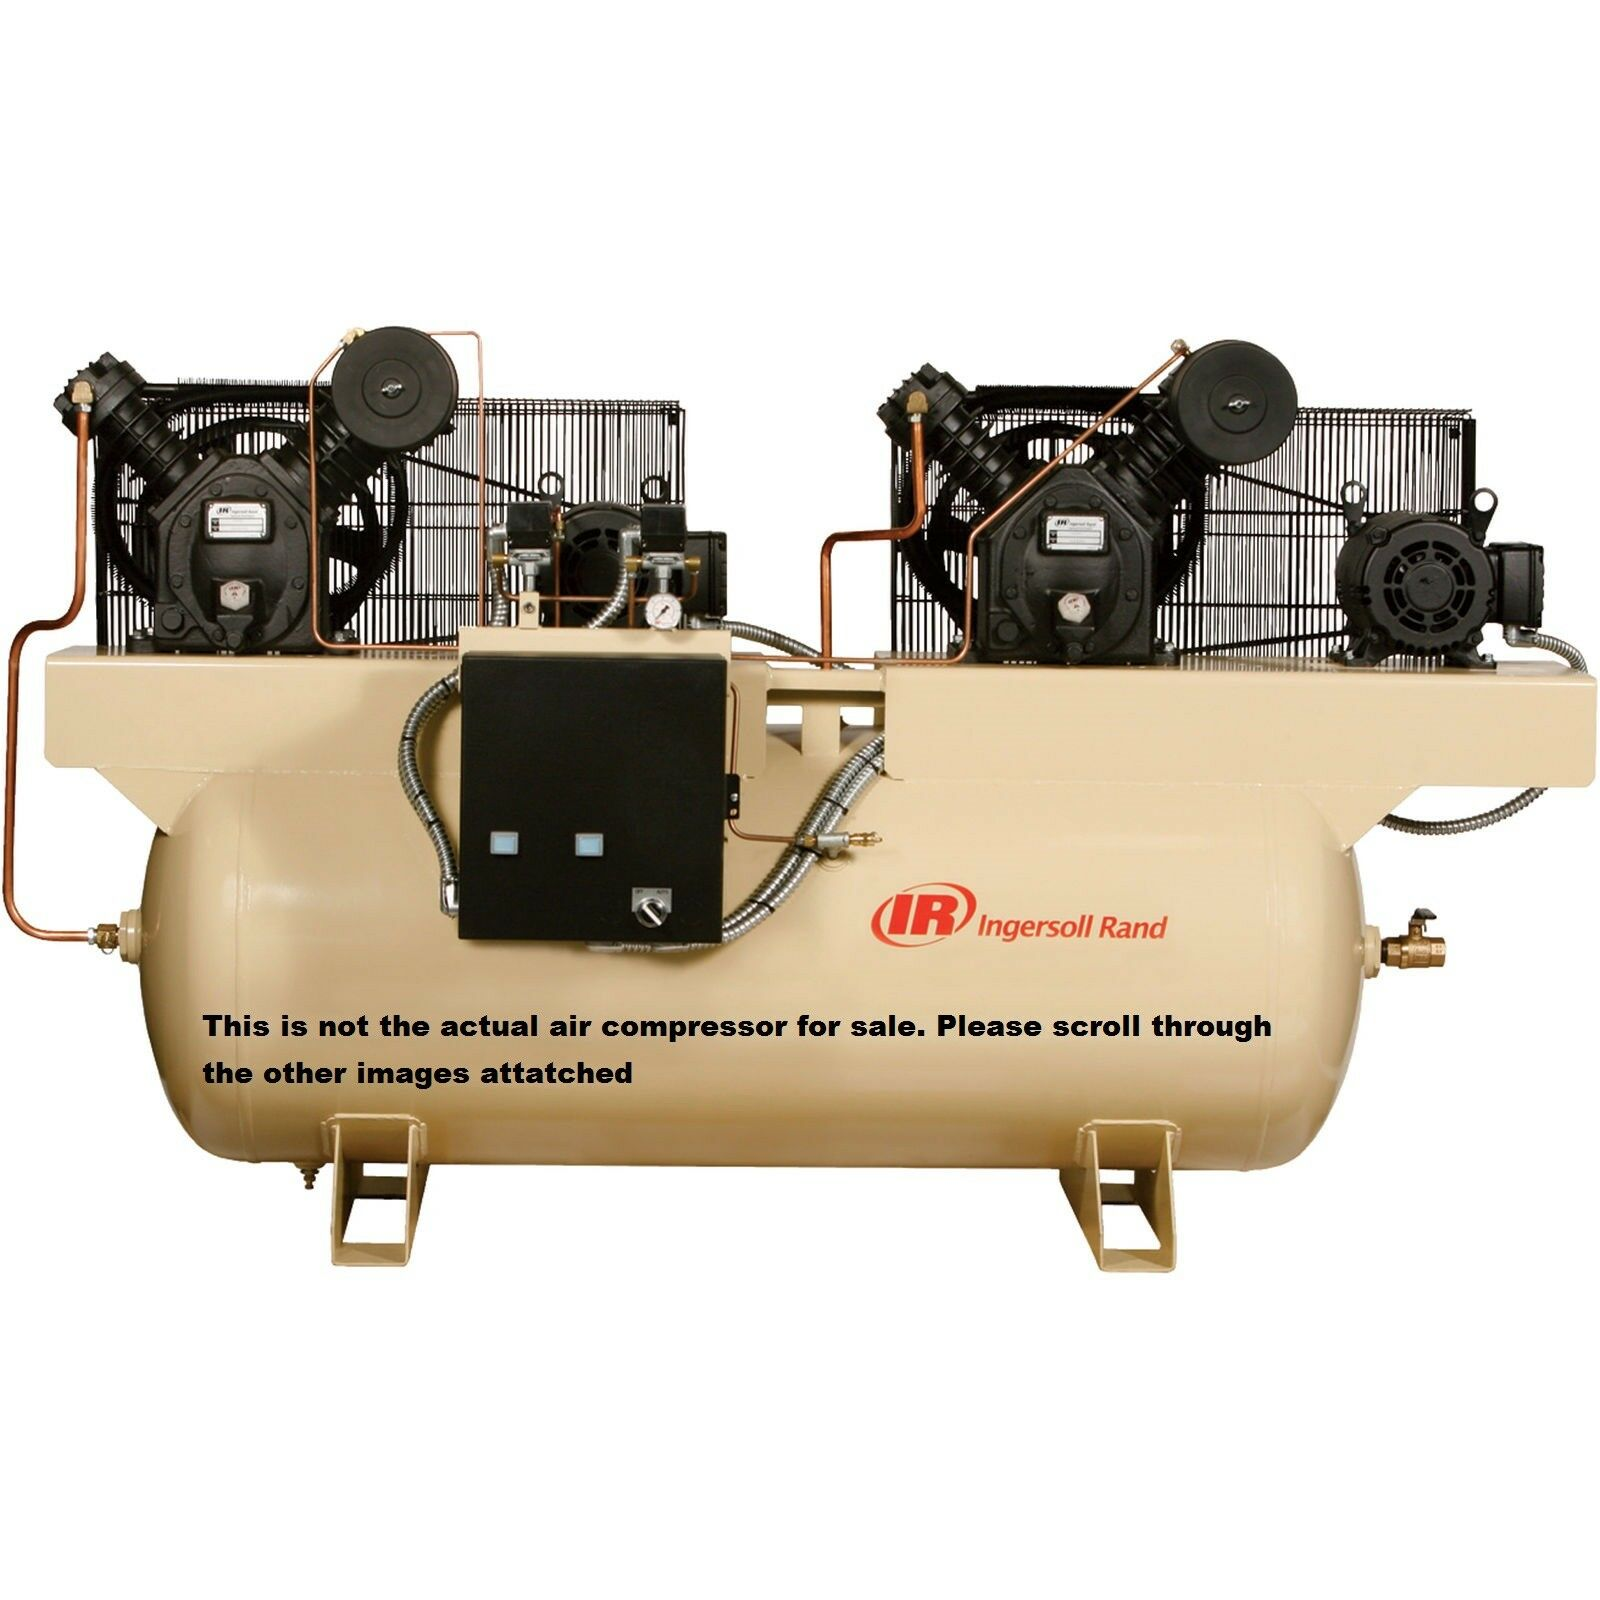 Ingersoll Rand Air Compressor- Duplex, 7.5 HP, 230 Volt 3 Ph